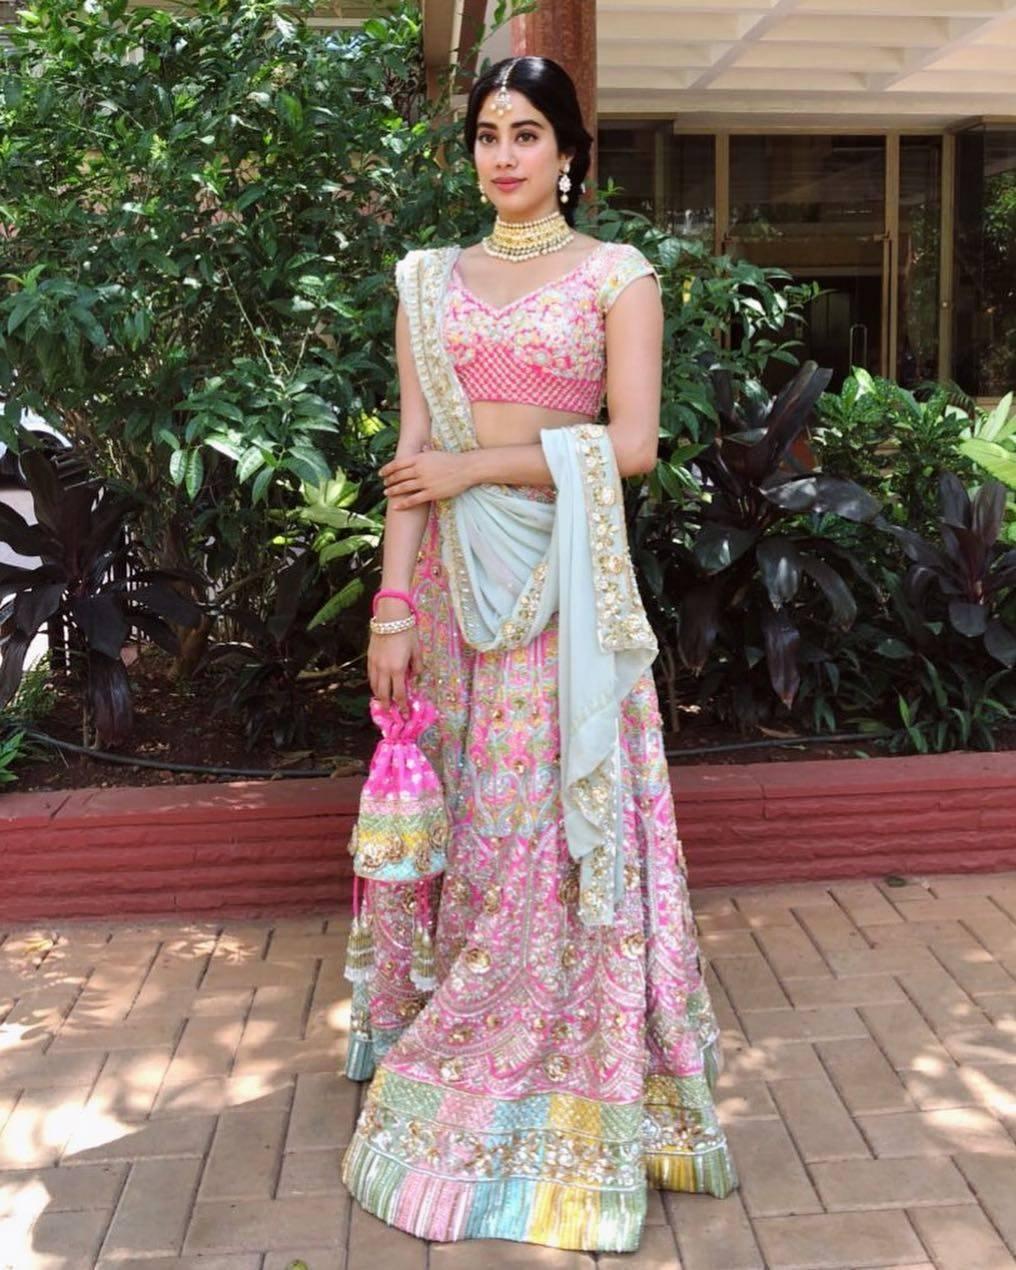 Janhvi at Sonam wedding_Manish insta